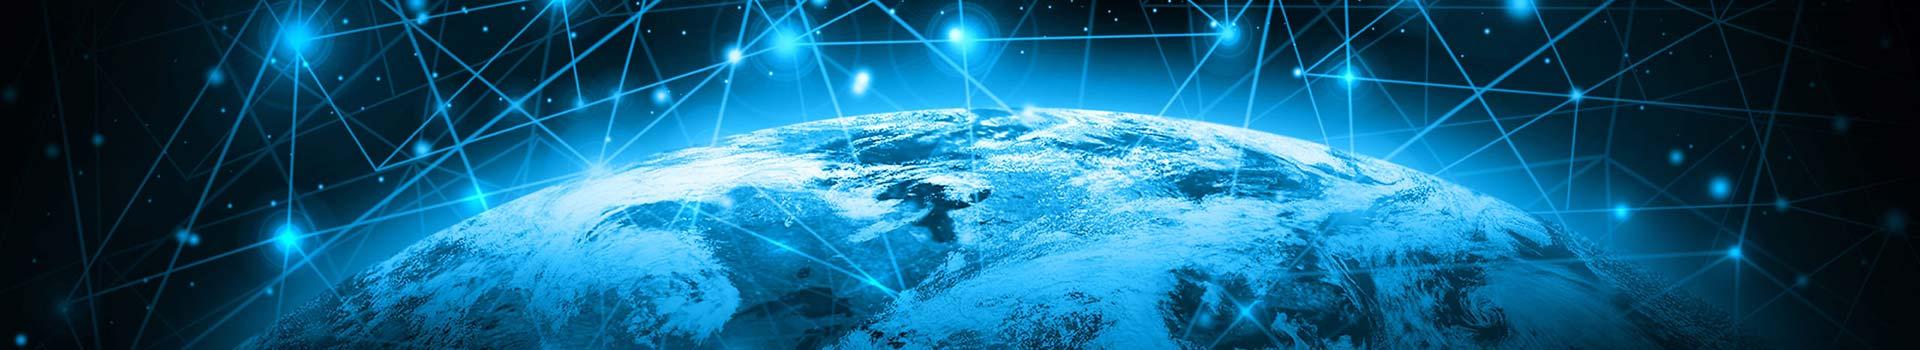 Defence Digital in-service technology uplift